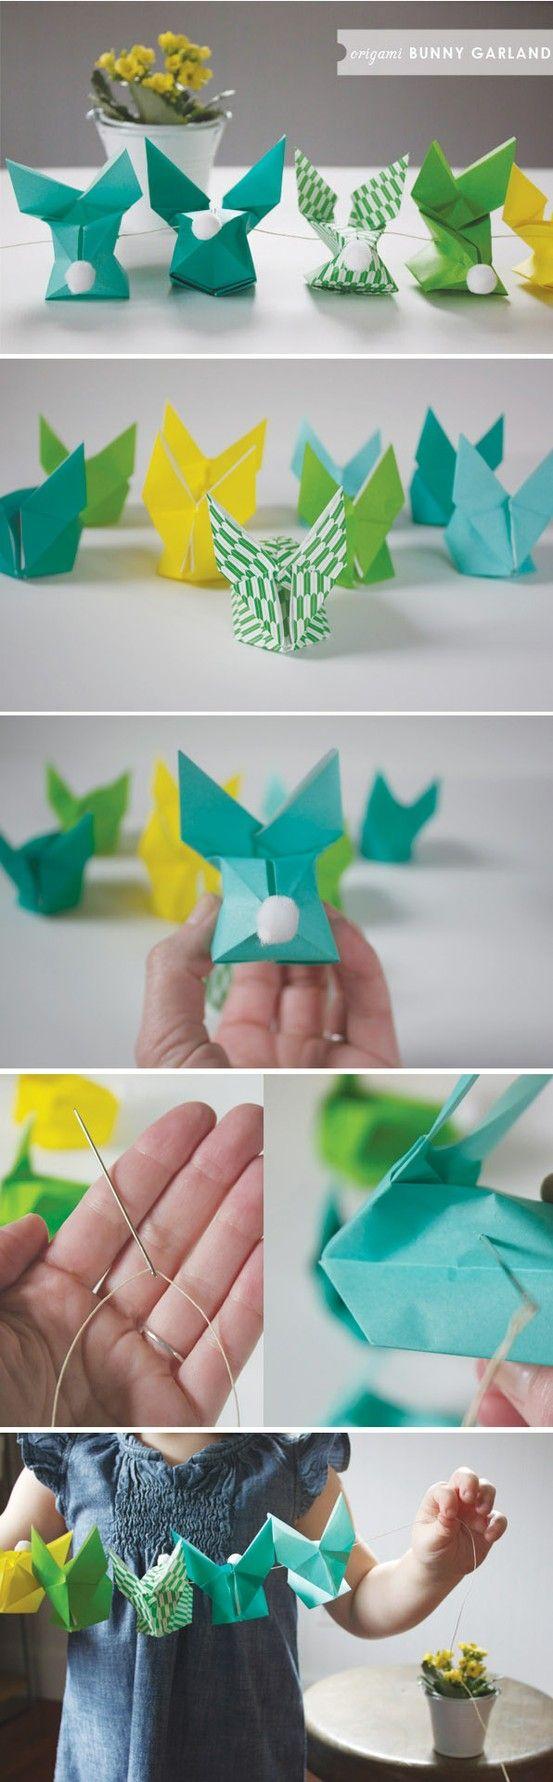 EASTER-- Origami Bunny Garland #easter #decoration #diy